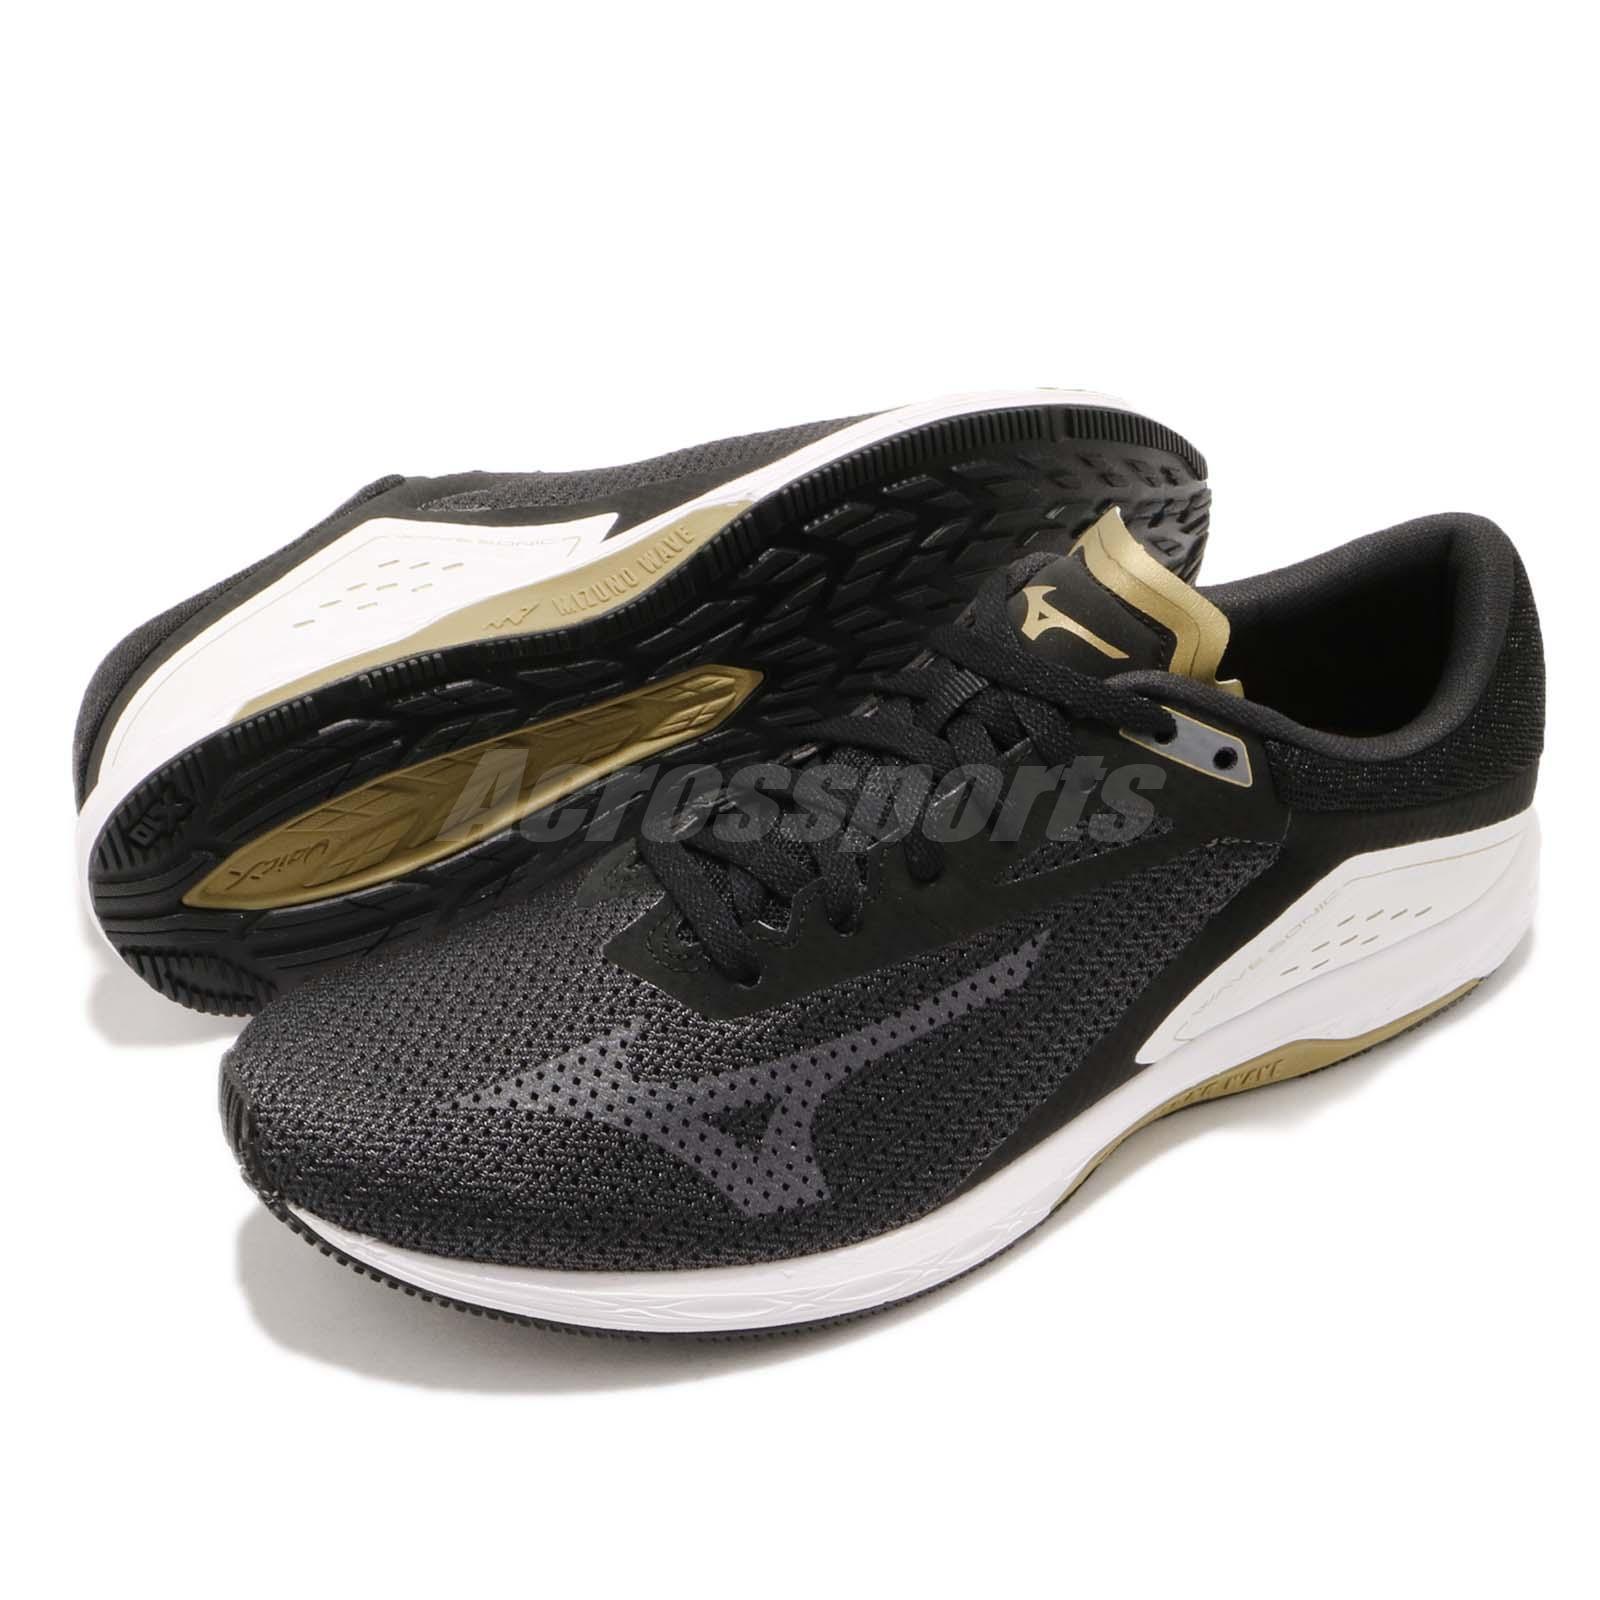 mizuno mens running shoes size 11 youth ii